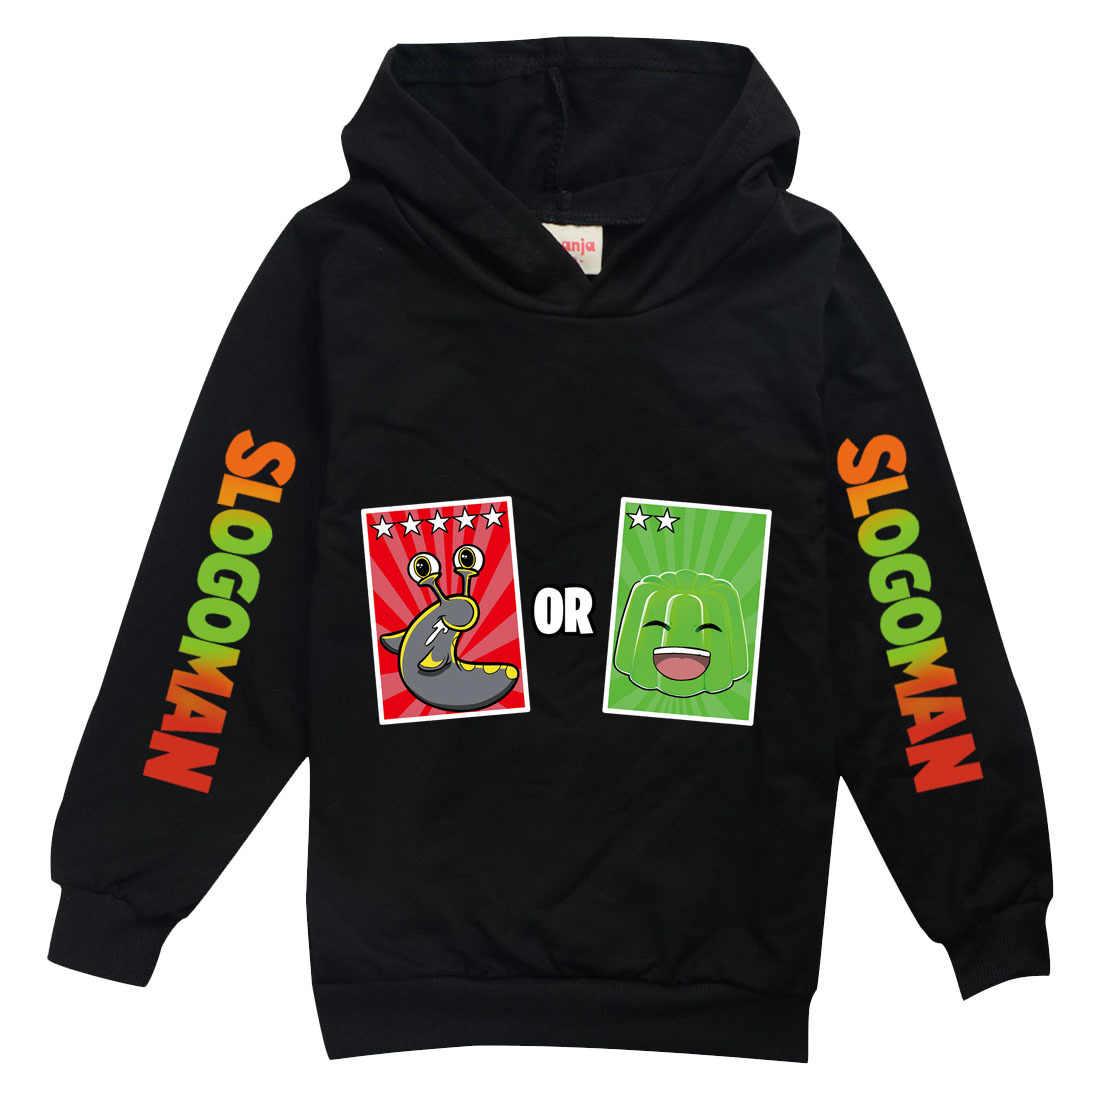 Mr Beast Clothes Hoodie for Teen Boys Girls Cool 3D Print Sweatshirt with Pocket Long Sleeve Hoodies